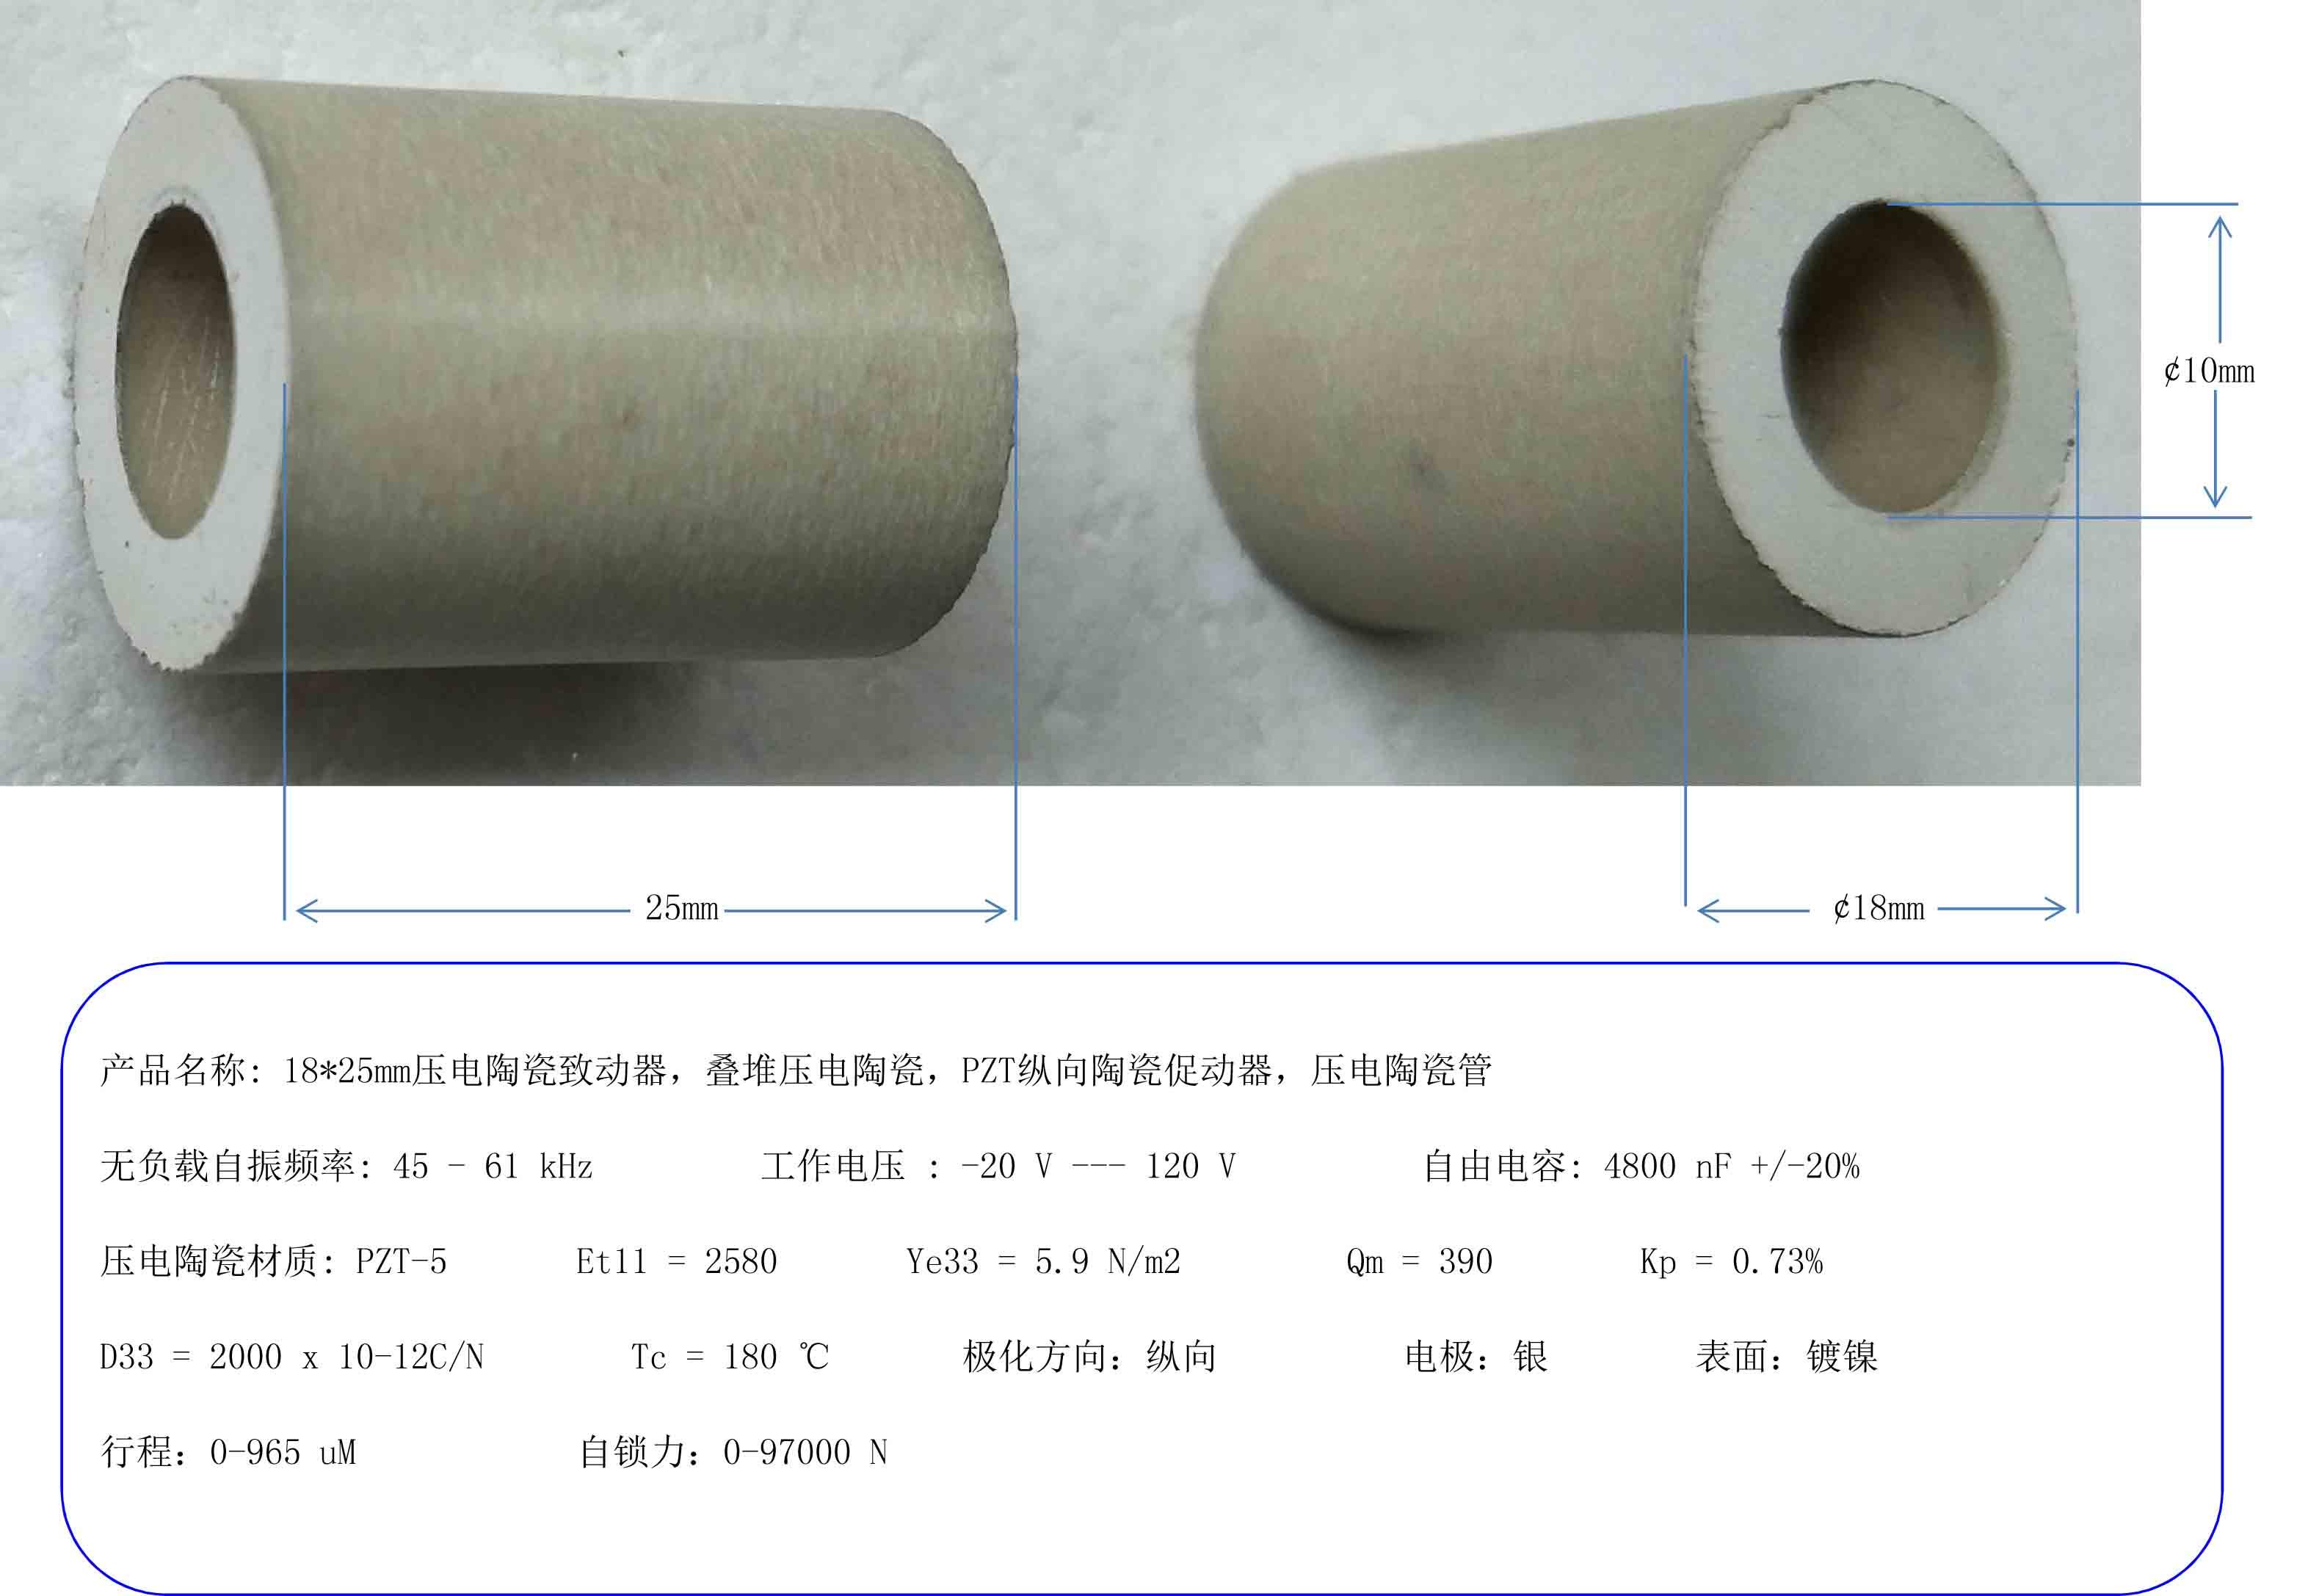 18*25 Piezoelectric Ceramic Actuators, Stacked Piezoelectric Ceramics, PZT Longitudinal Actuators, Piezoelectric Ceramic Tubes pzt piezoelectric ceramic atomizer medical piezoelectric ceramic piece